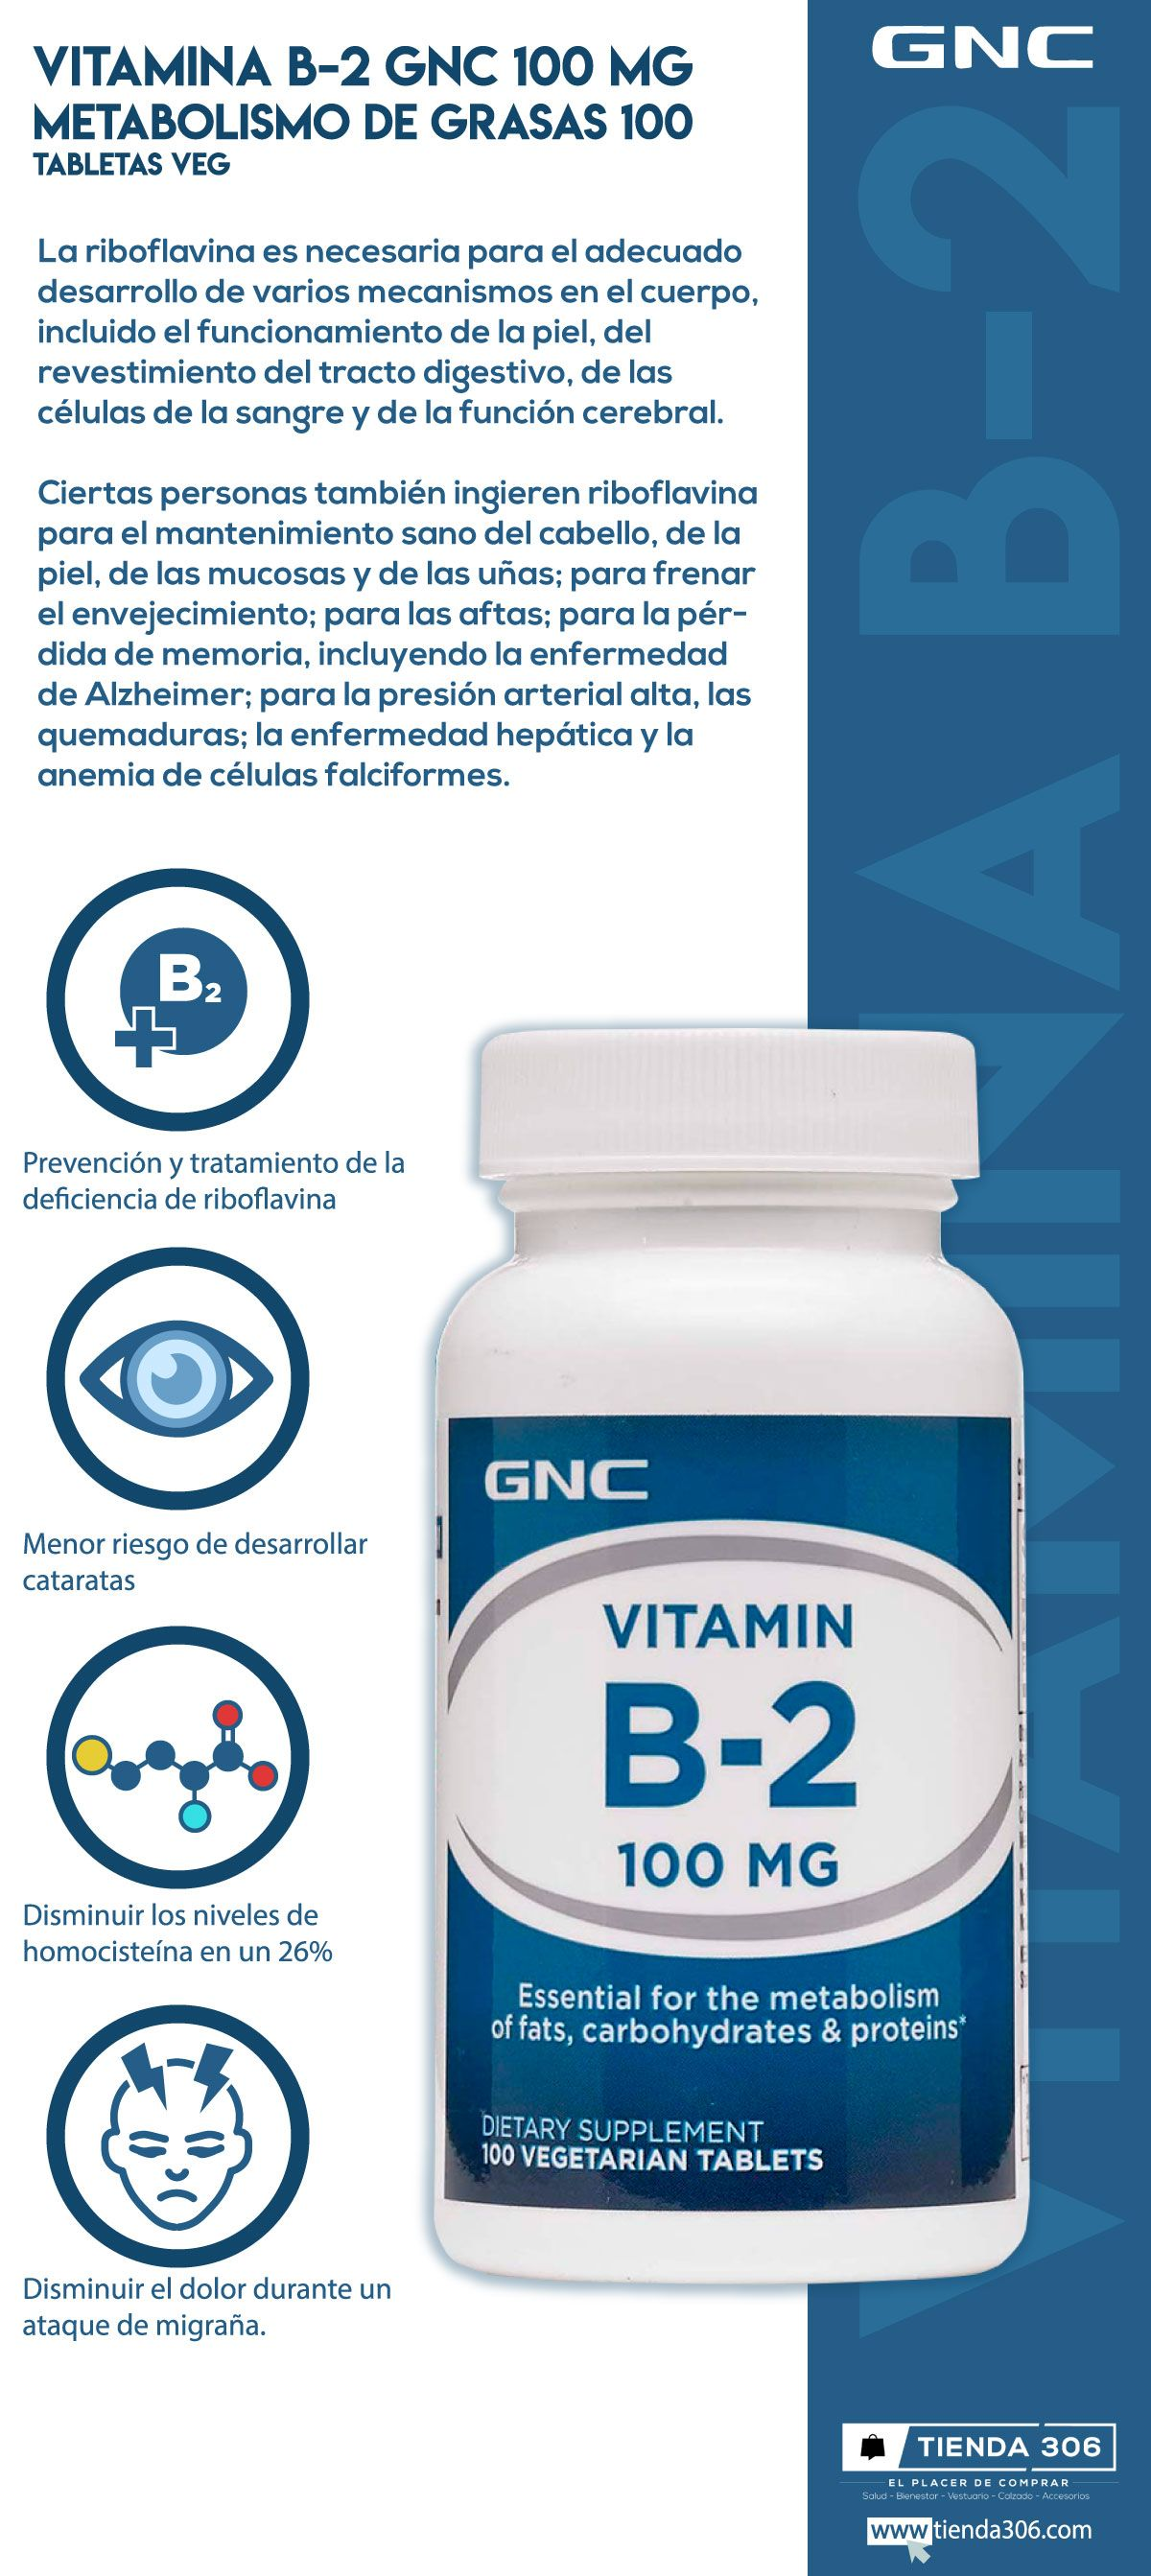 Vitamina B 2 Gnc 100 Mg Metabolismo De Grasas 100 Tabletas Veg En